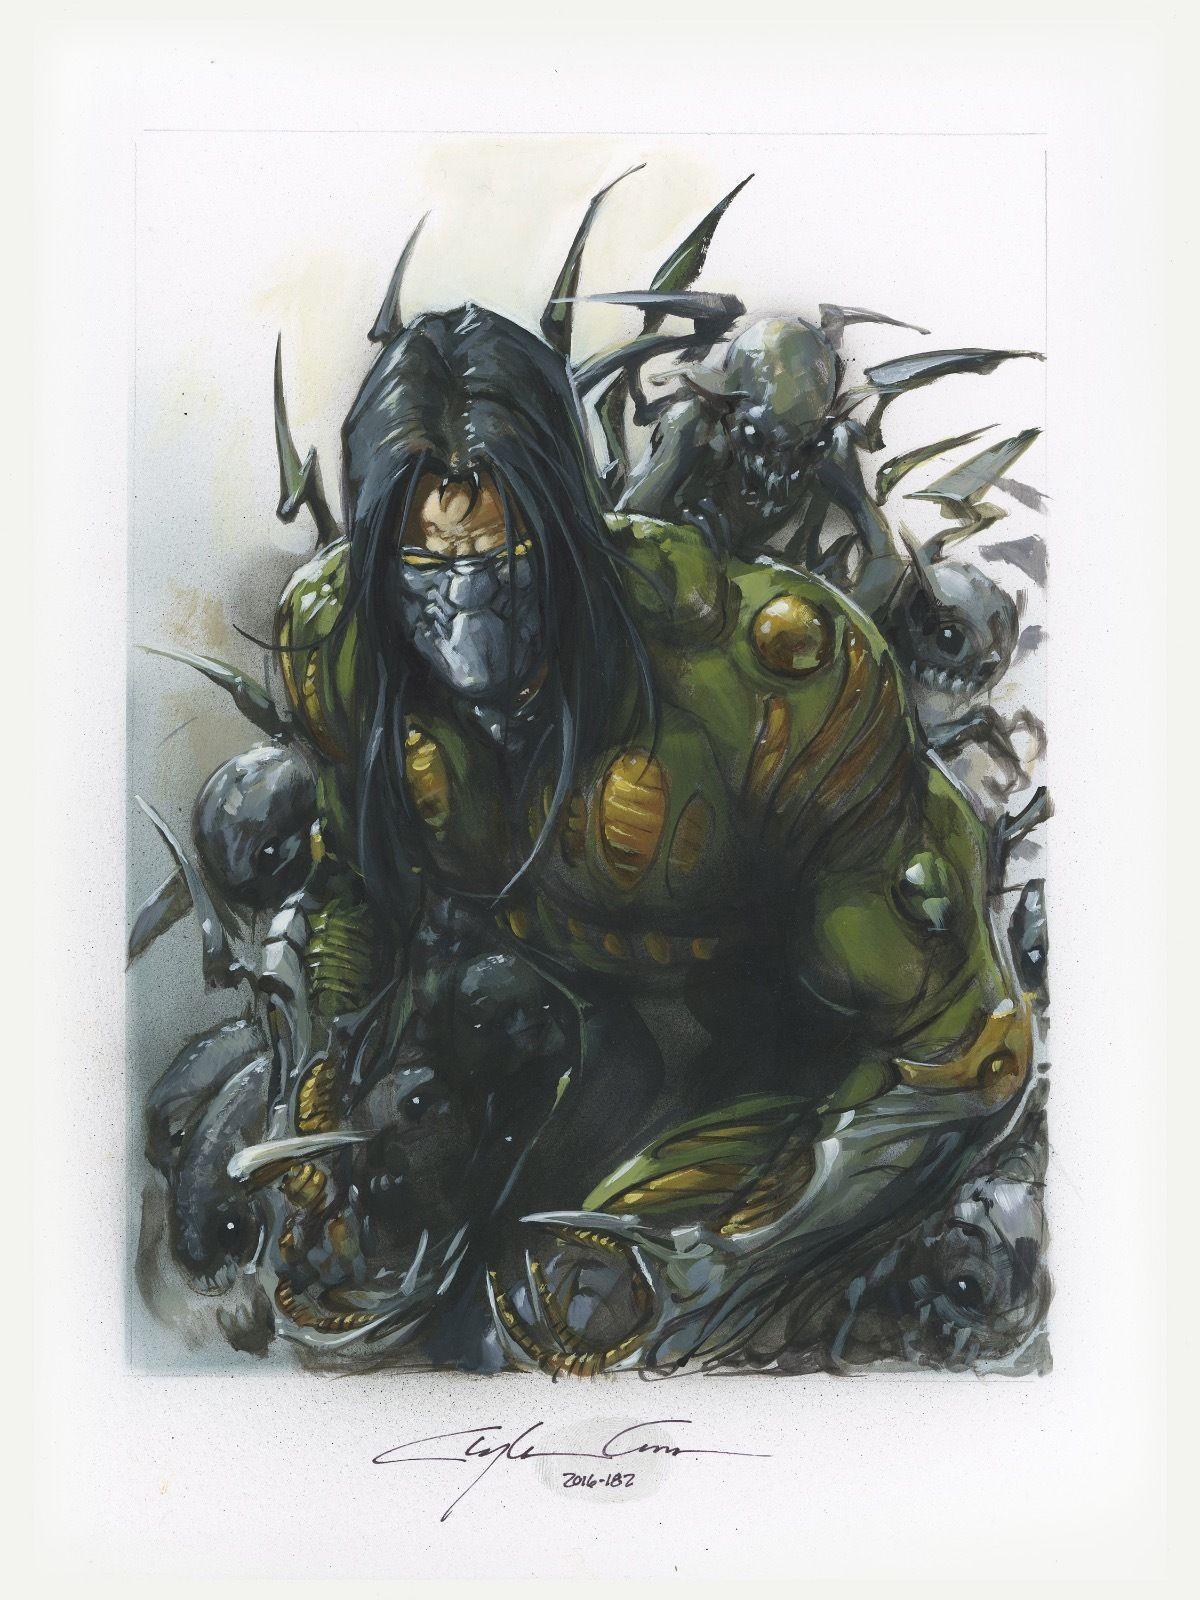 Clayton Crain original acrylic painting The Darkness Comic Art Auction